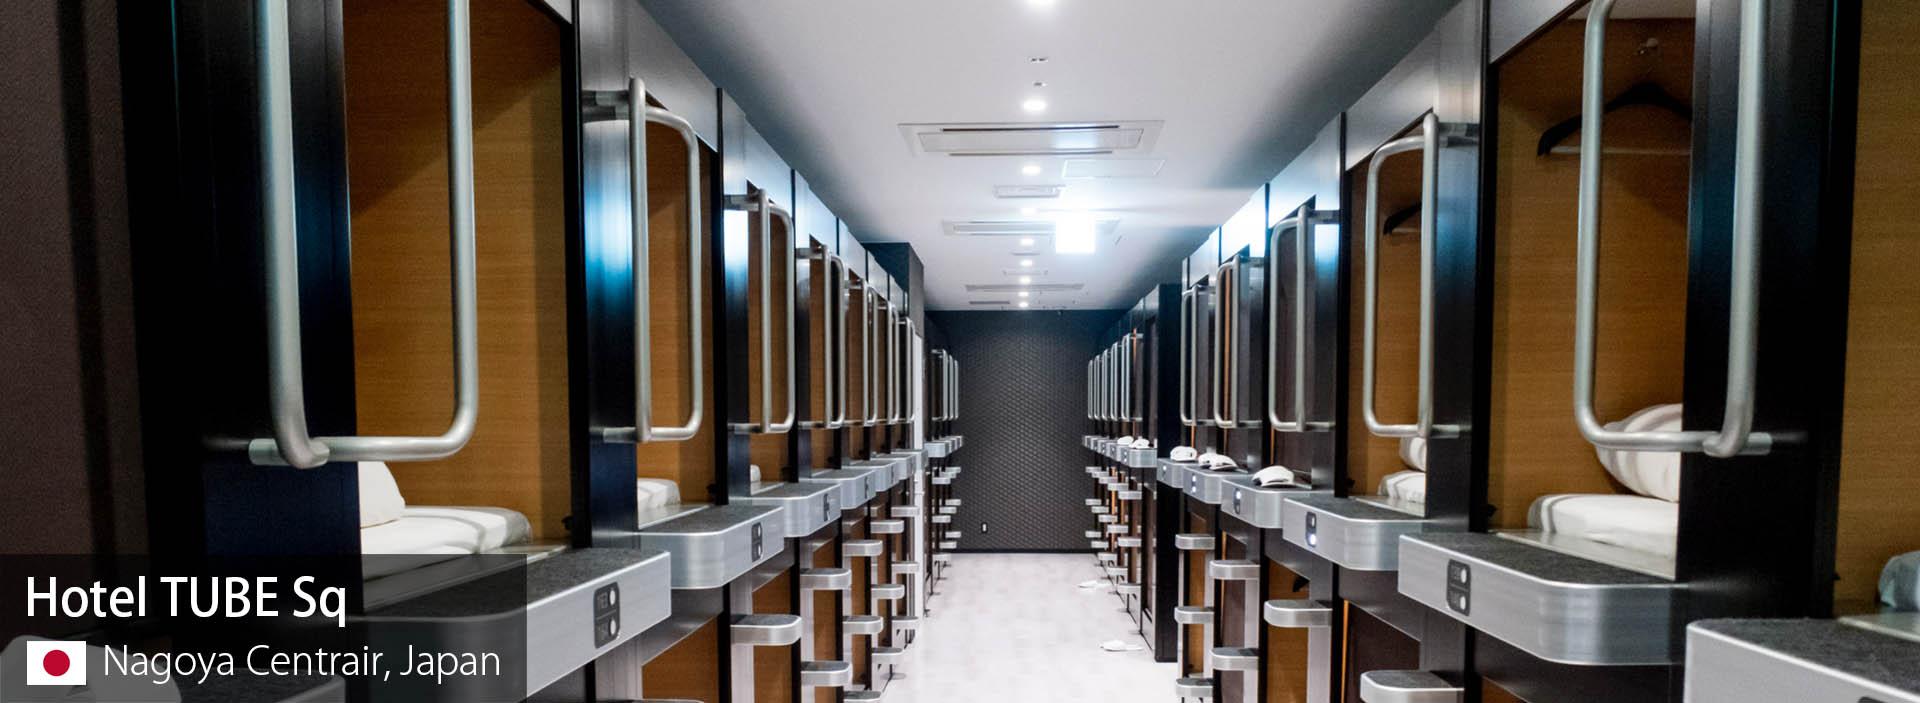 Airport Hotel Review: TUBE Sq Capsule Hotel at Nagoya Centrair